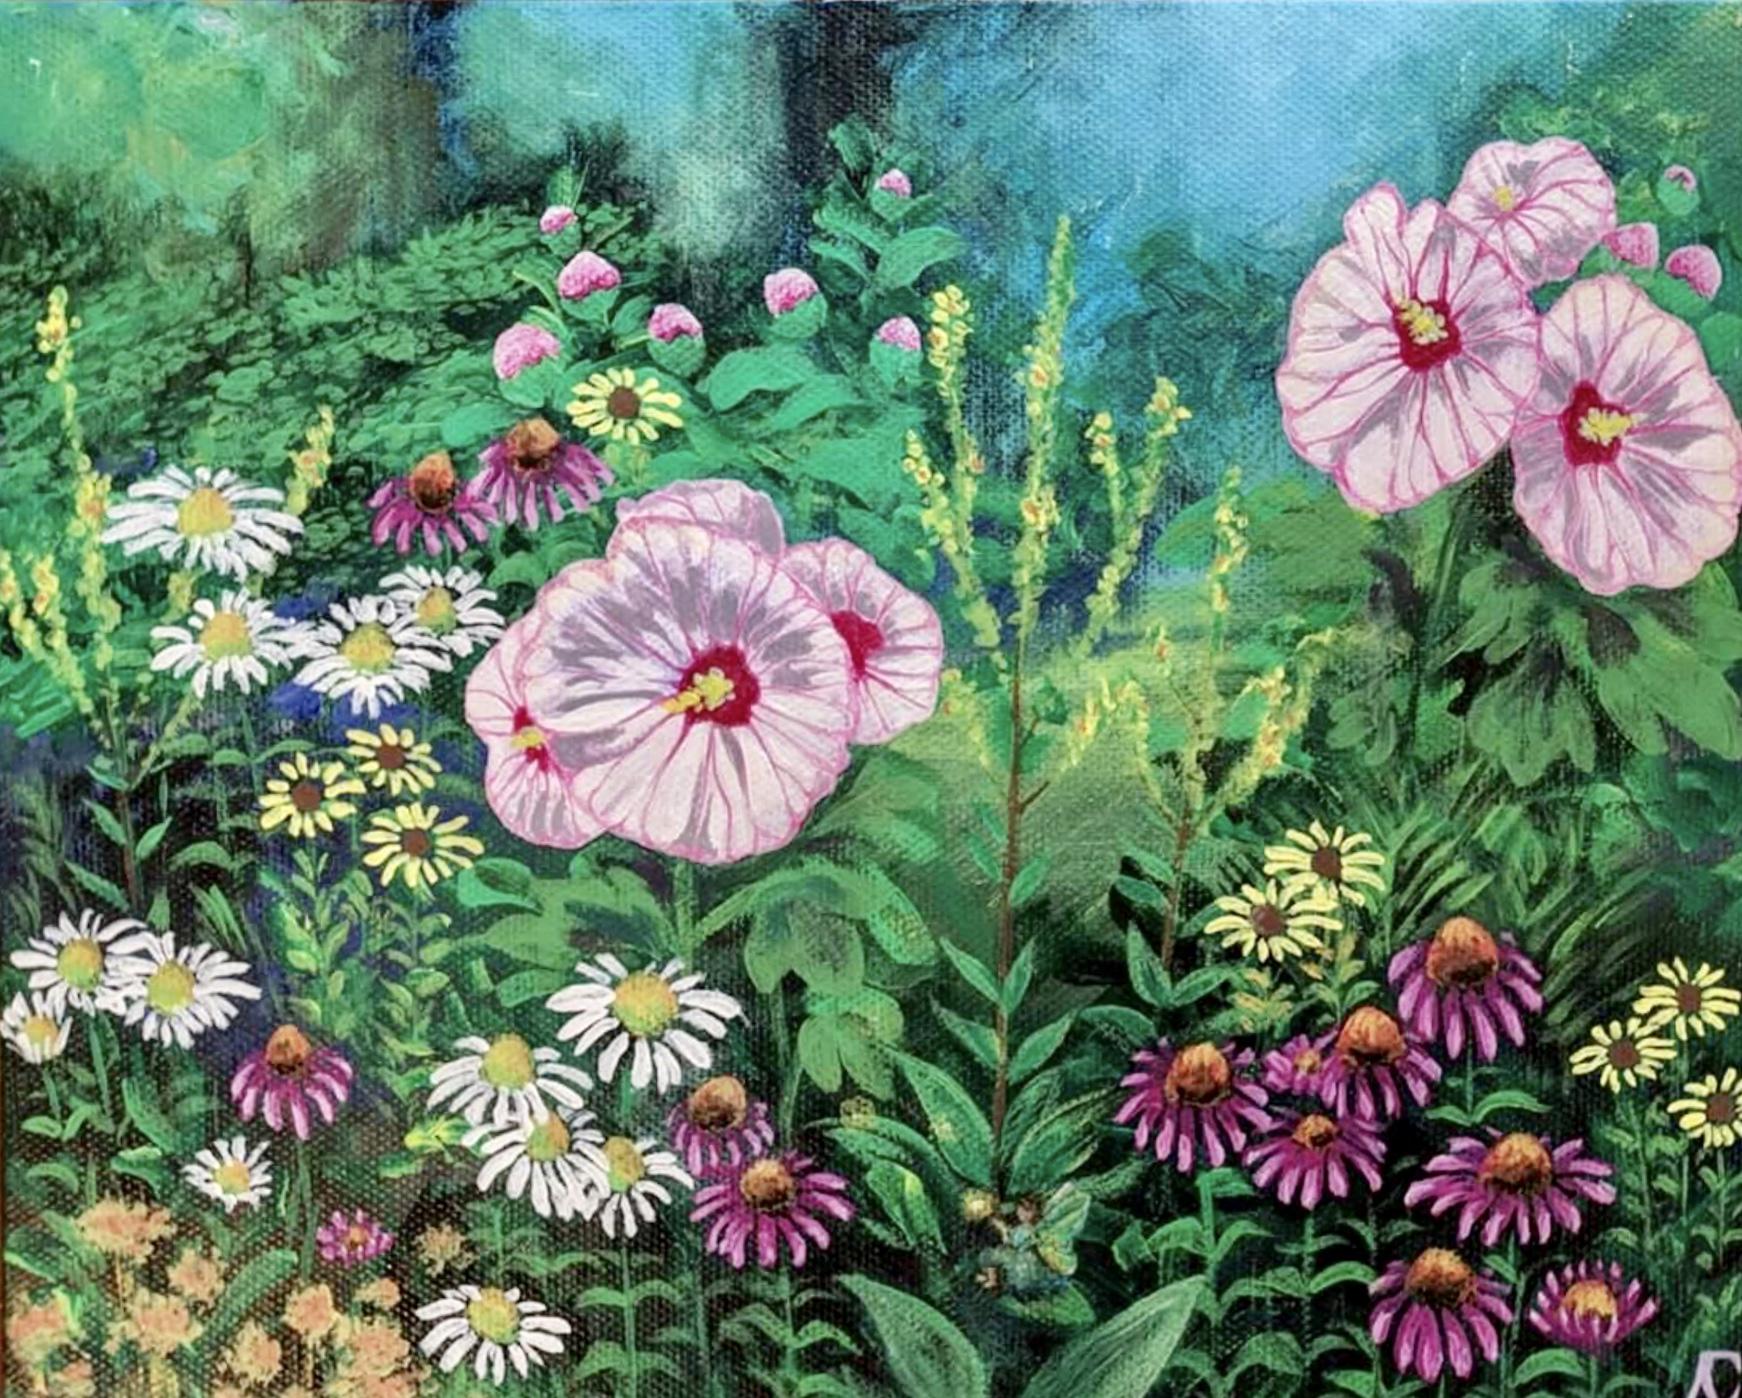 'Fleurishes' celebrates flower power